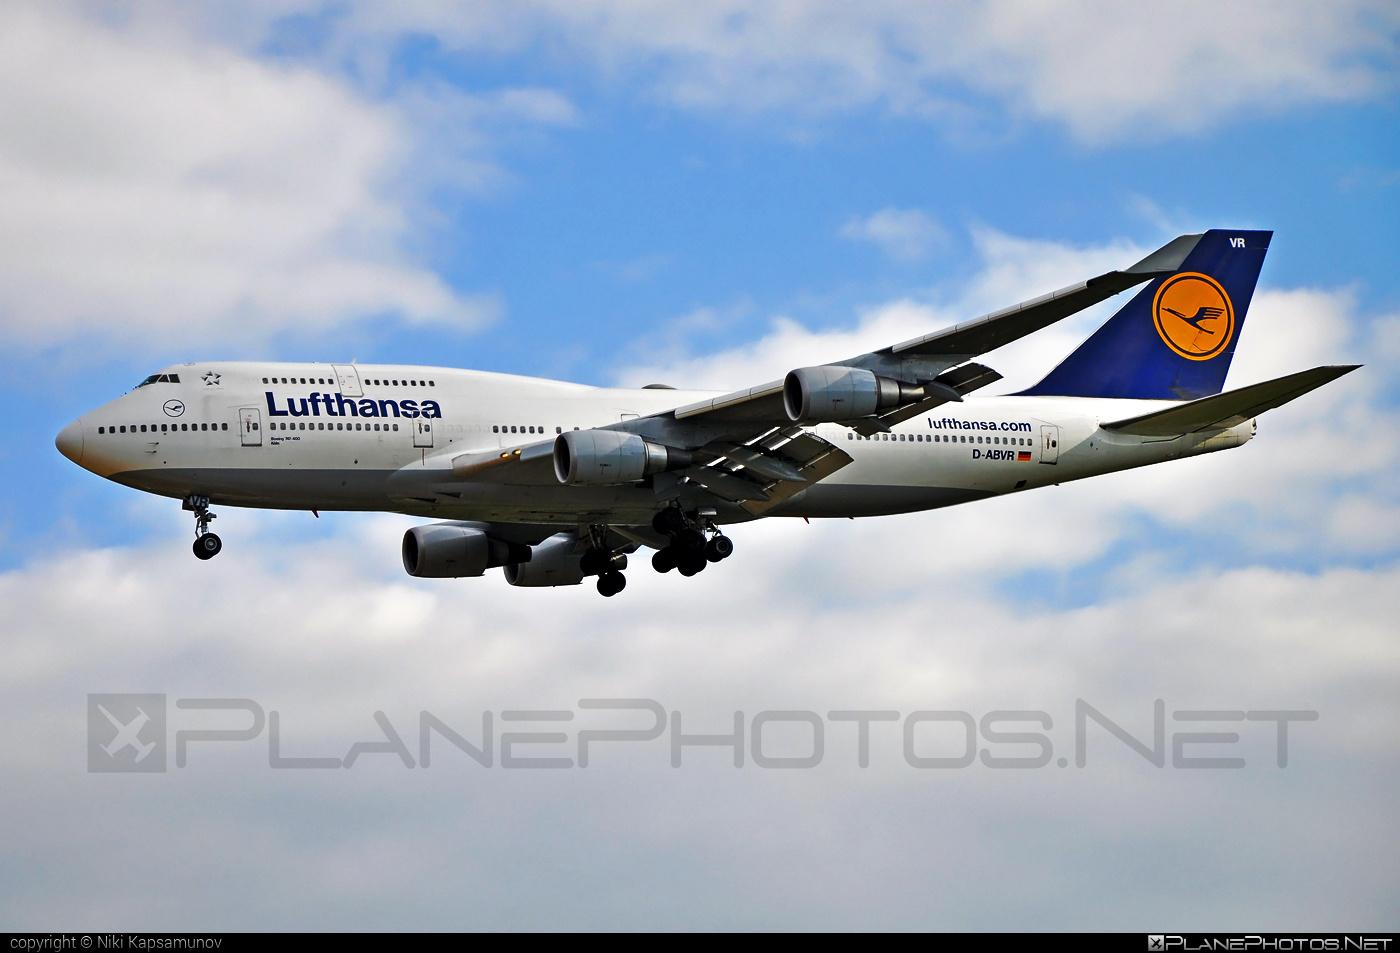 Boeing 747-400 - D-ABVR operated by Lufthansa #b747 #boeing #boeing747 #jumbo #lufthansa